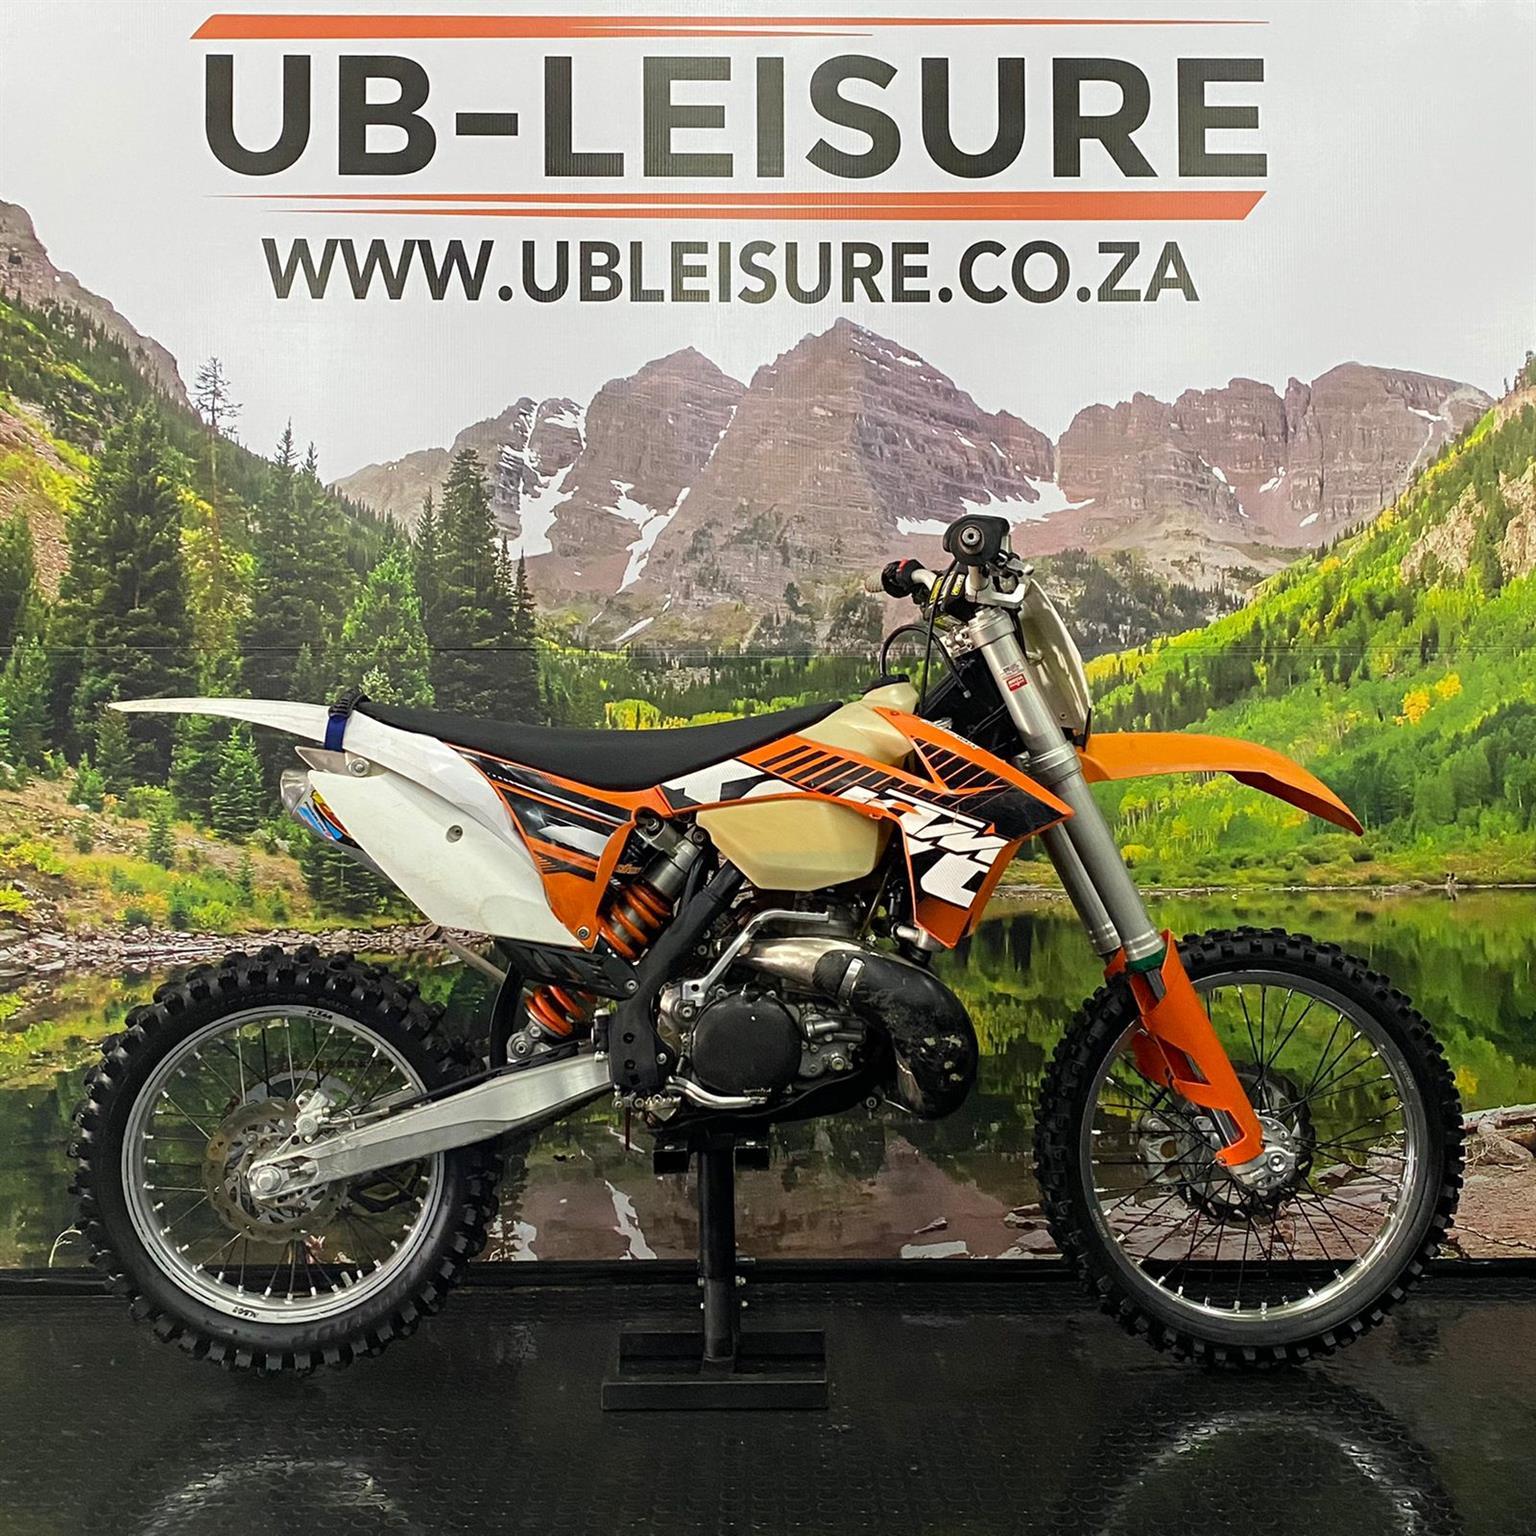 2013 KTM 300 XCW | UB LEISURE